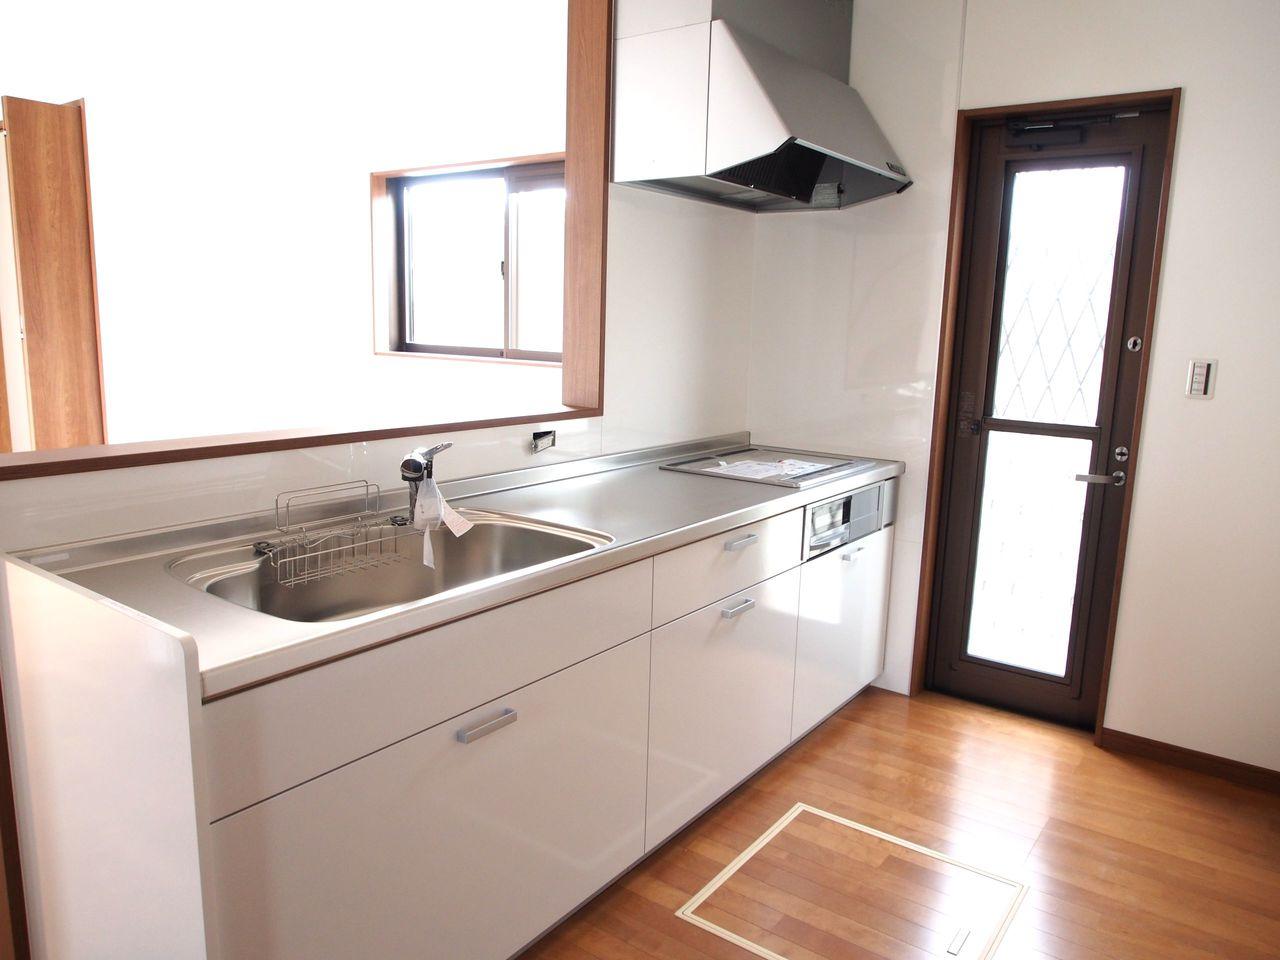 IHクッキングヒーターと食洗器を完備。